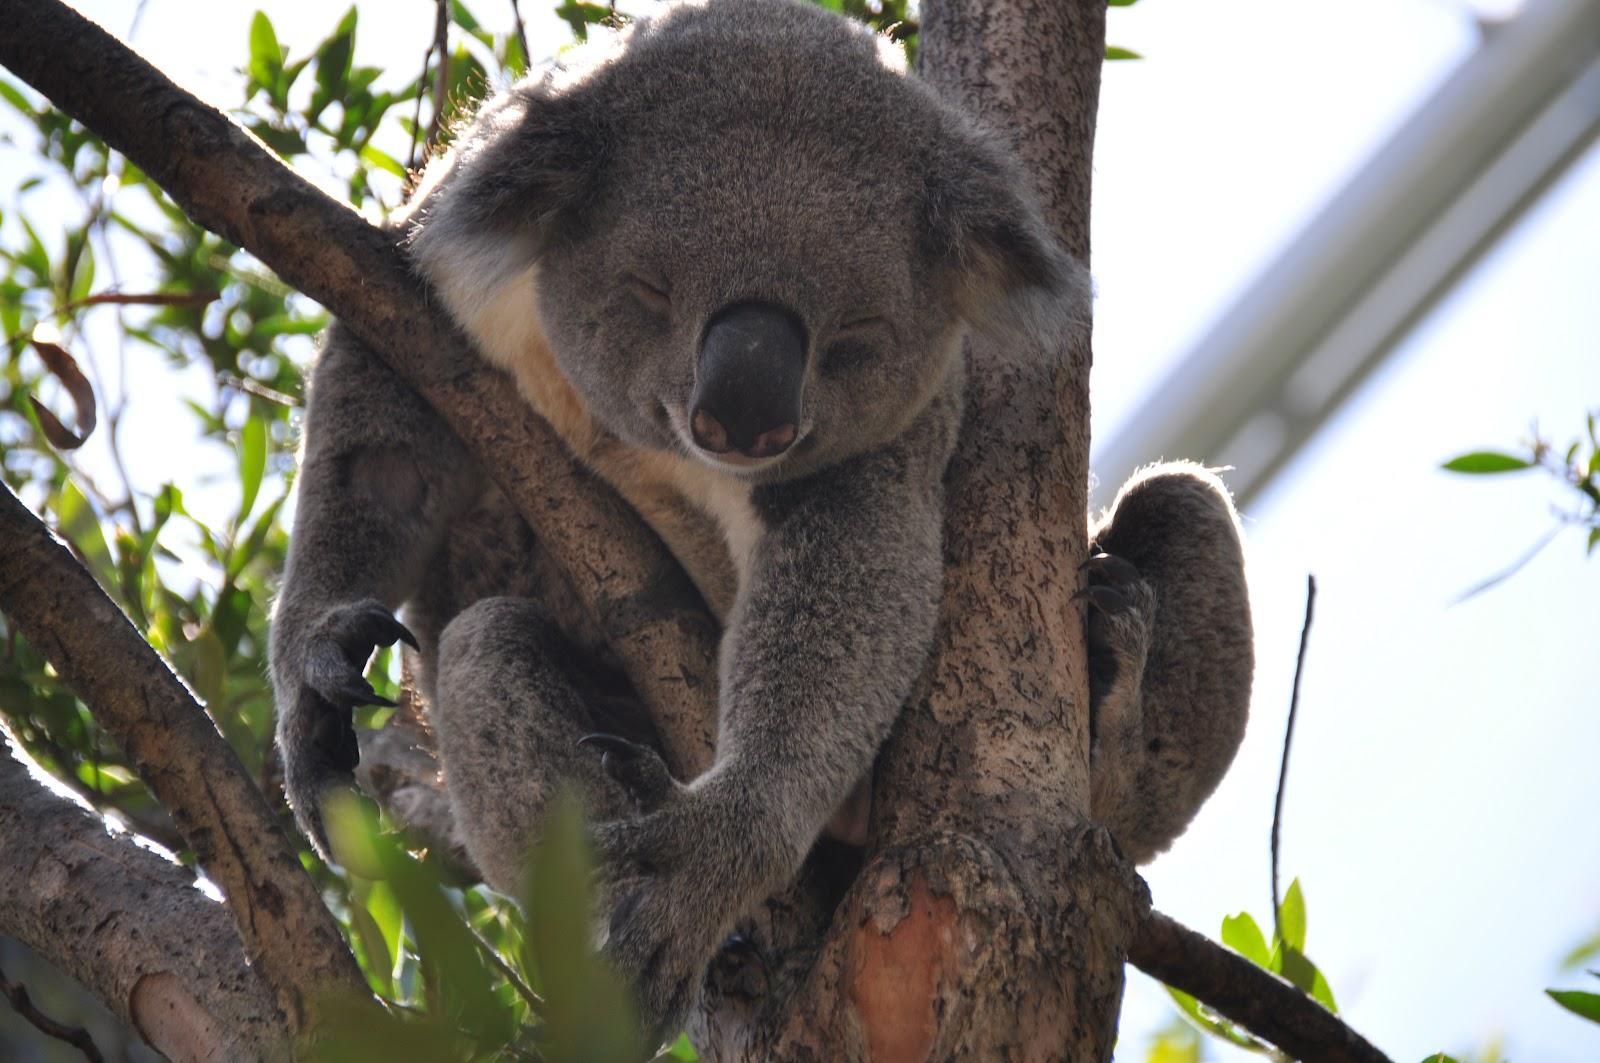 cute smiling koala sleeping on a tree in Kennett river, australia. It is one of the must-see spots along the great ocean road in victoria.